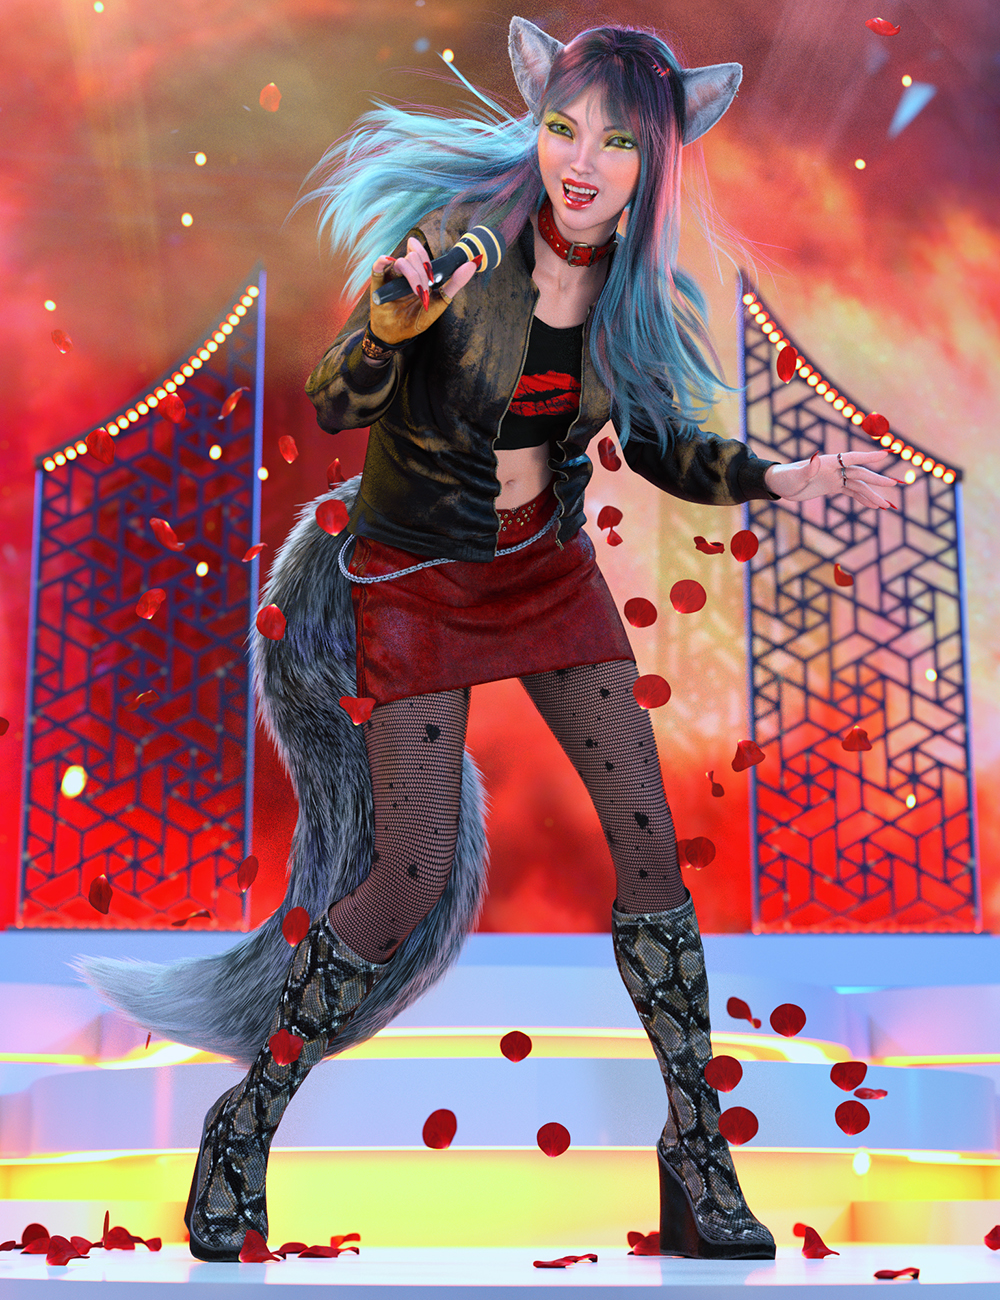 dForce Poison Love Outfit Textures by: Shox-Design, 3D Models by Daz 3D